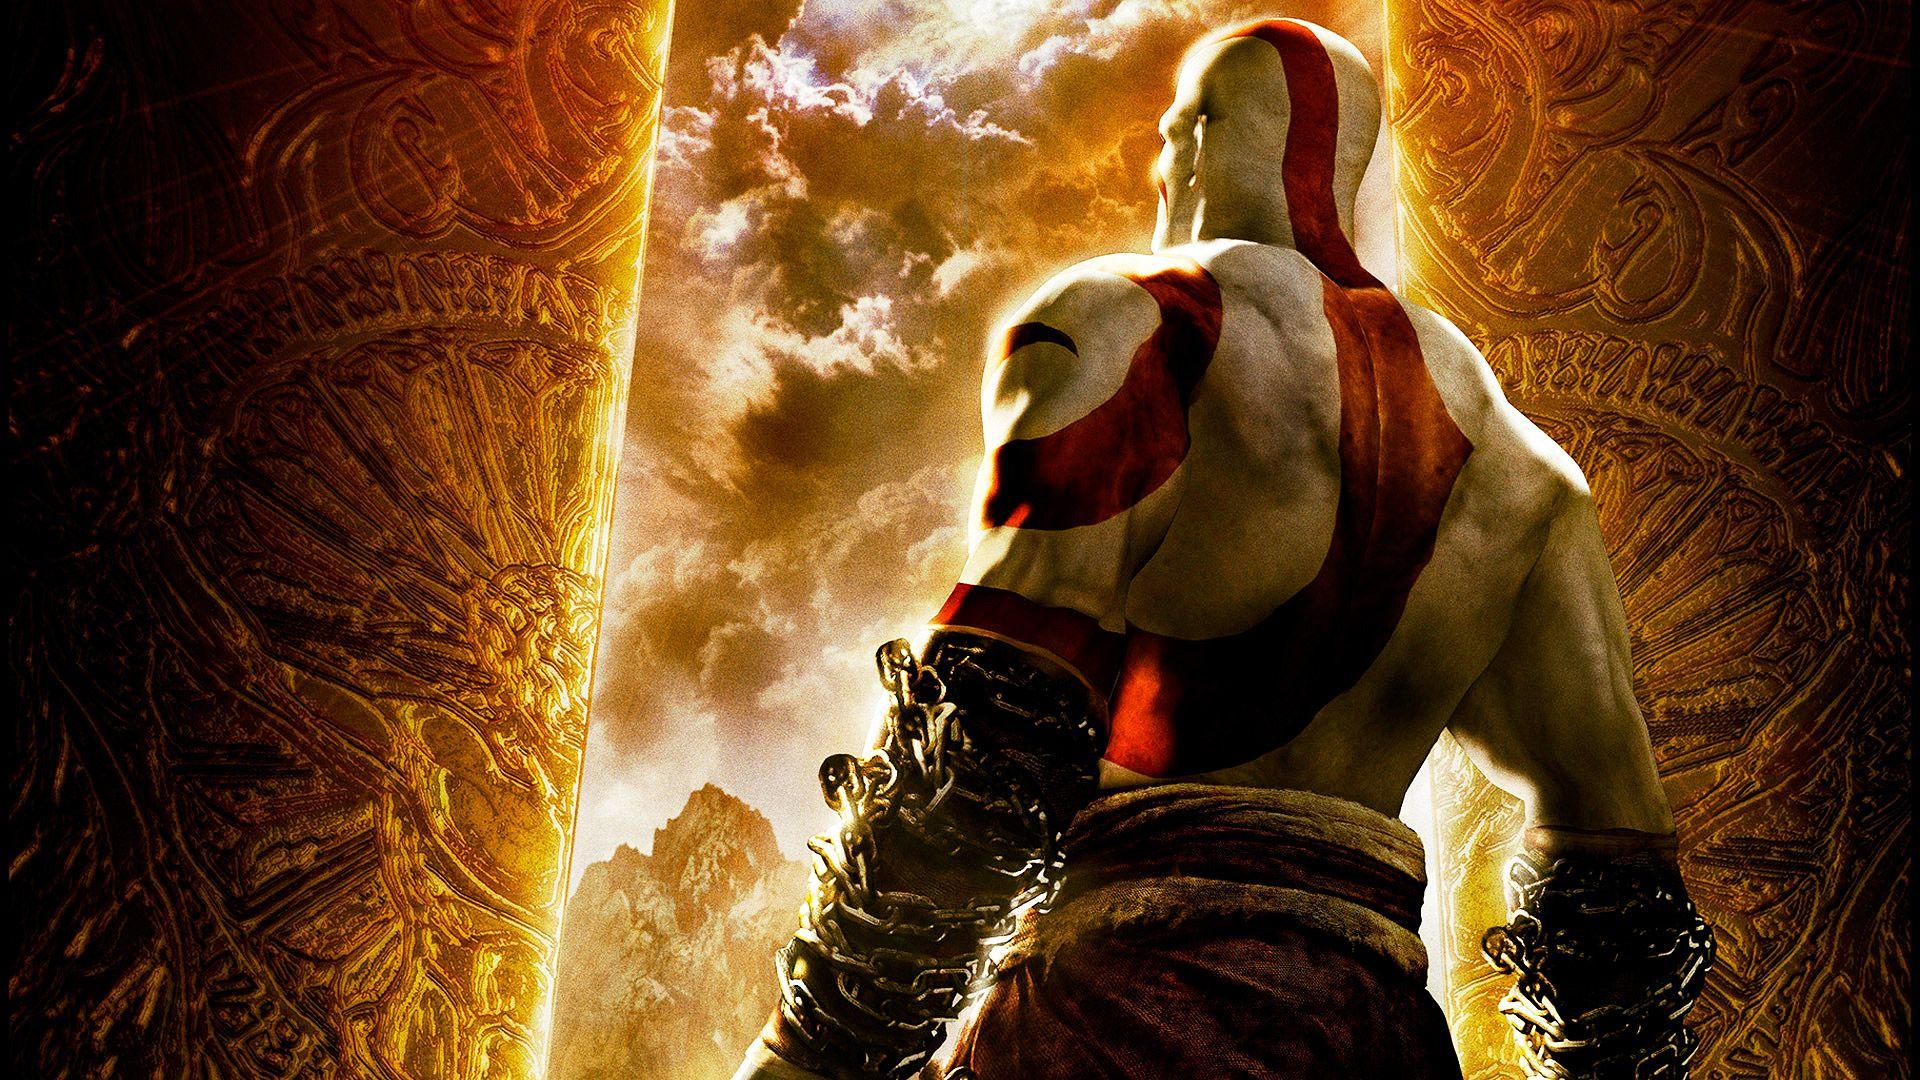 God Of War 3 Kratos Wallpaper Photo 8mk Kratos God Of War